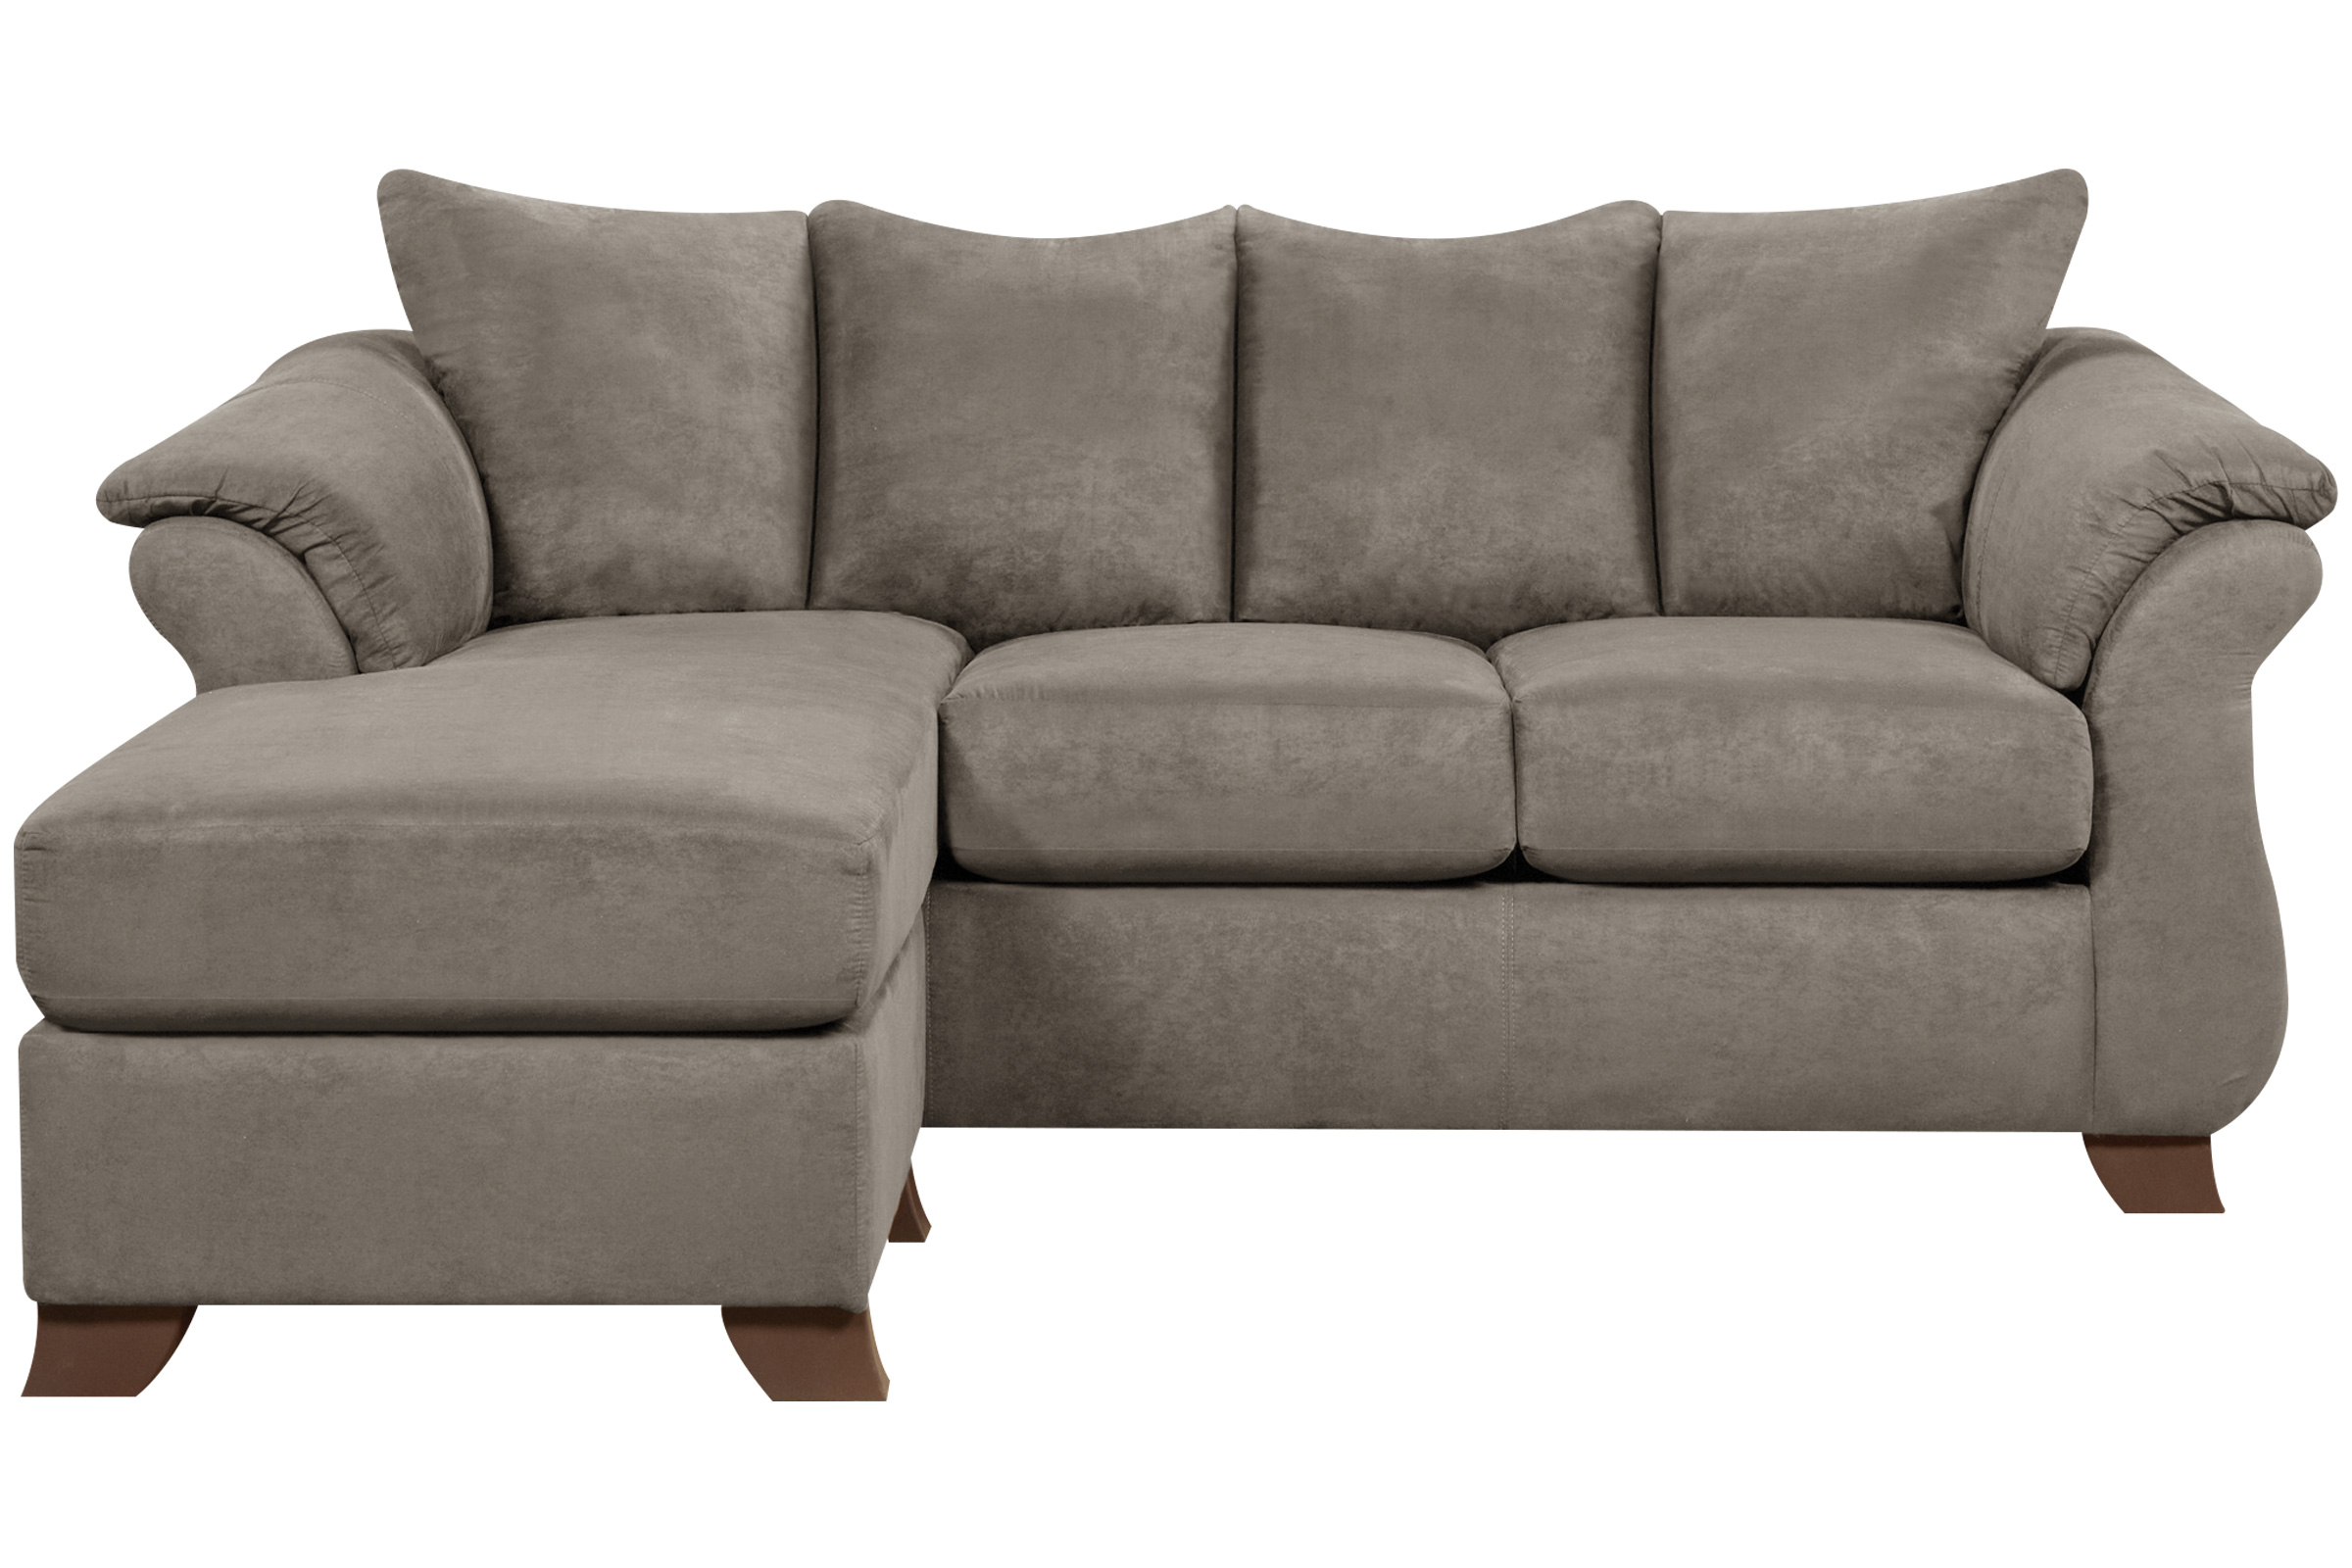 Upton Microfiber Sofa with Floating Ottoman